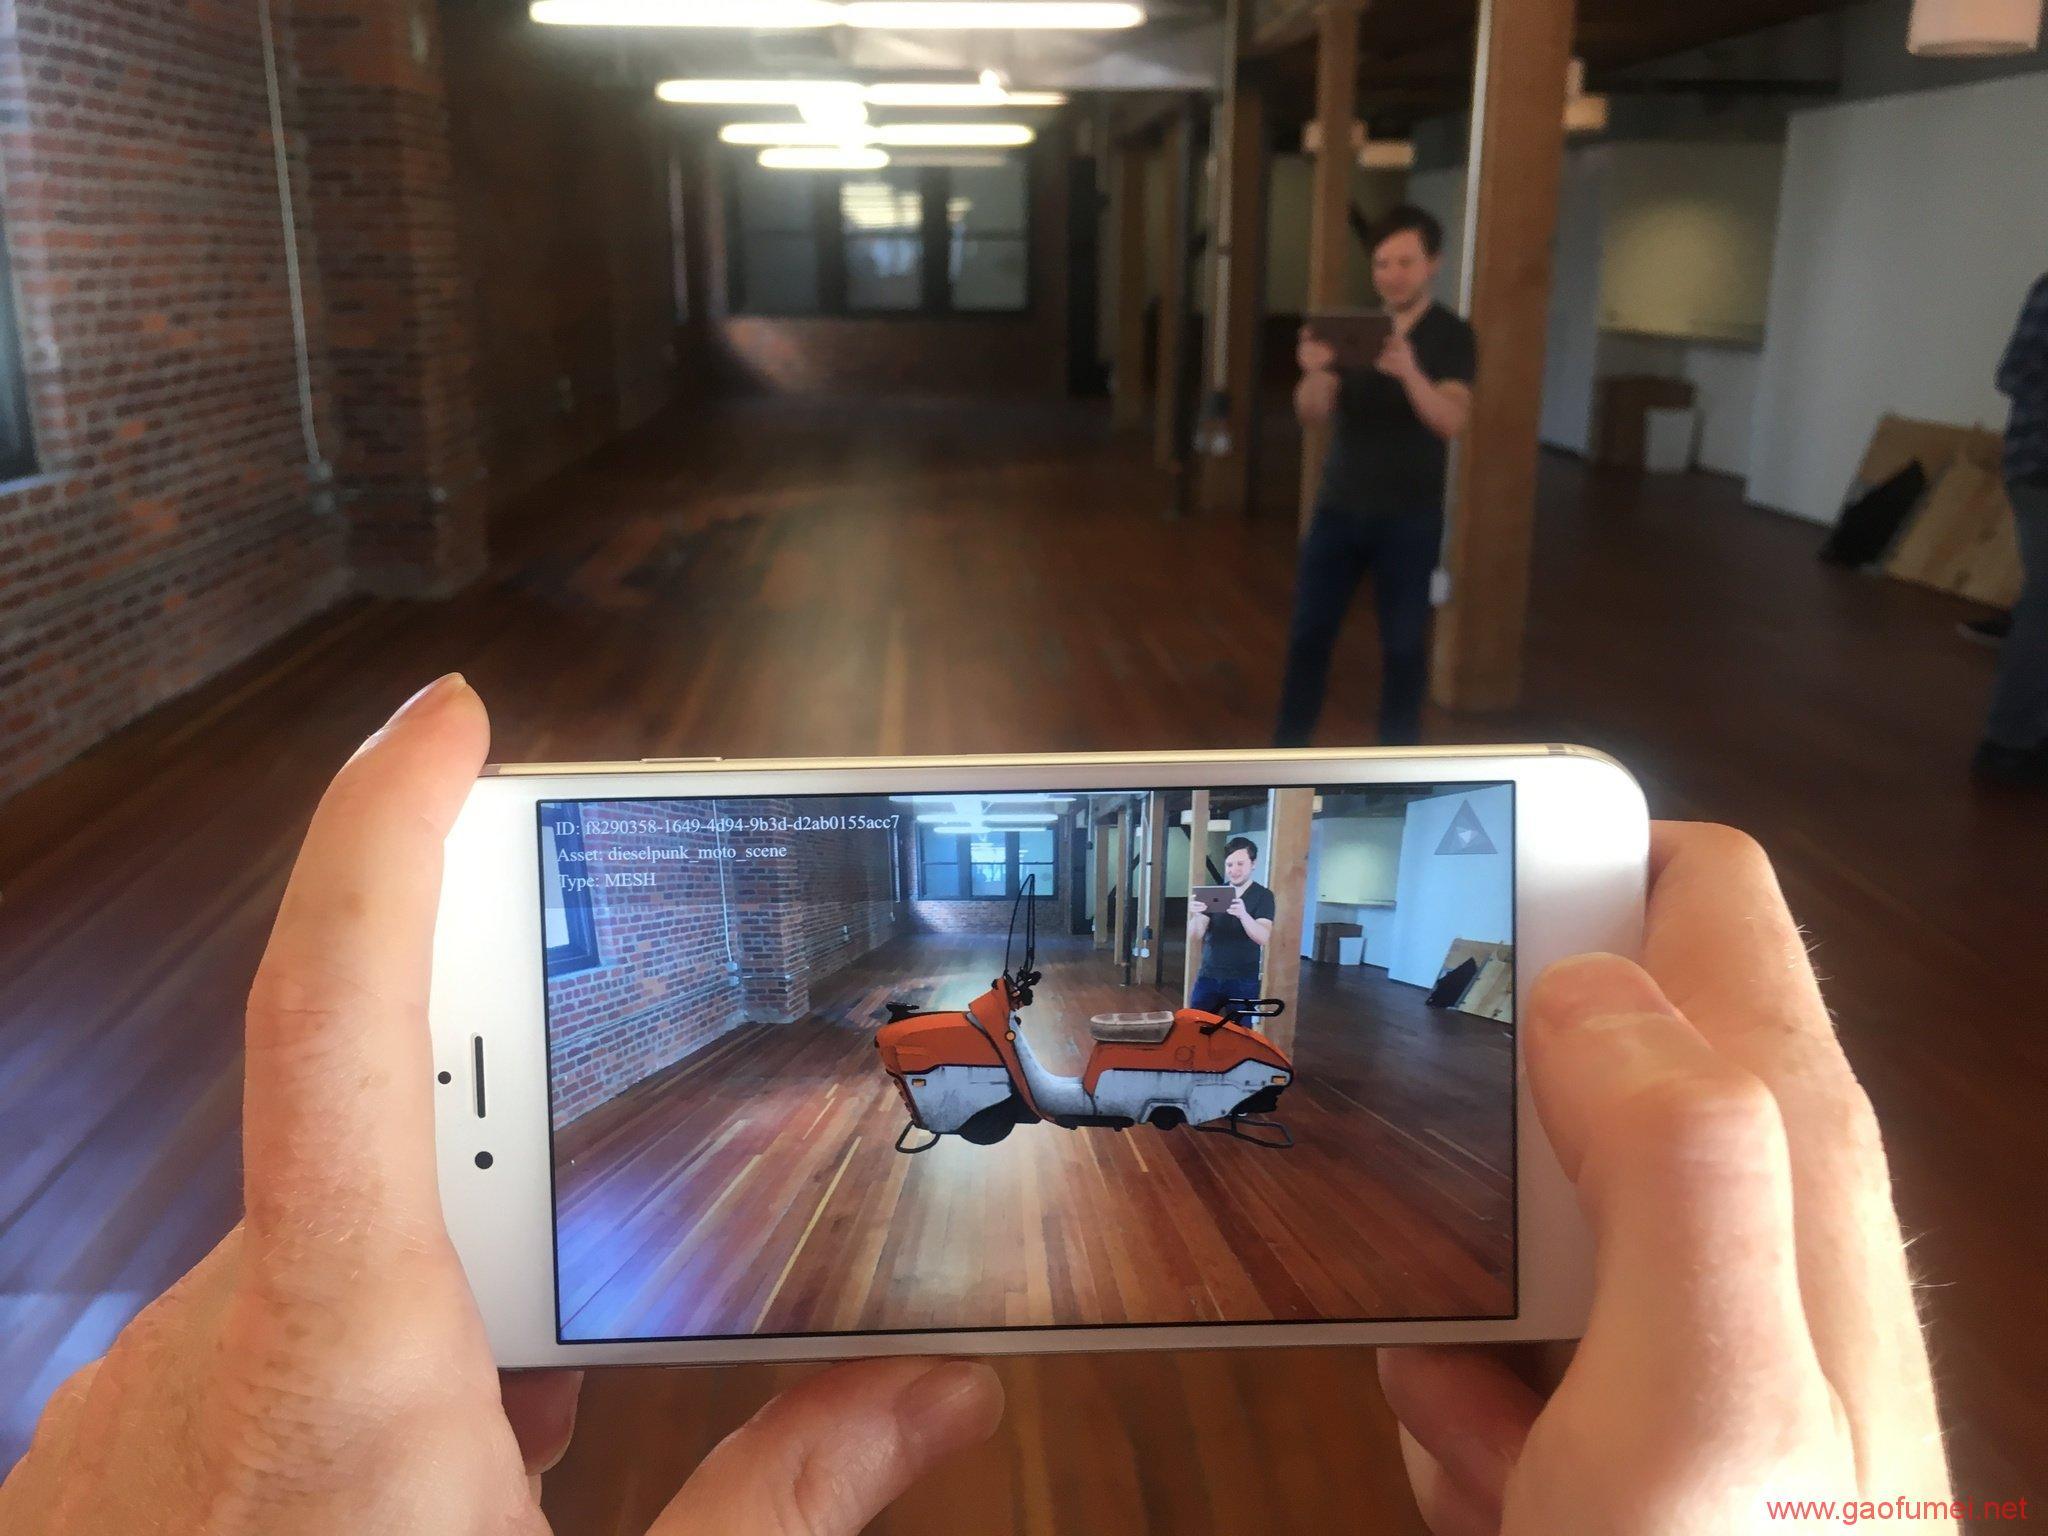 Torch 3D完成350万美元融资推进VR和AR内容创作民主化 虚拟现实 第1张-泥人传说